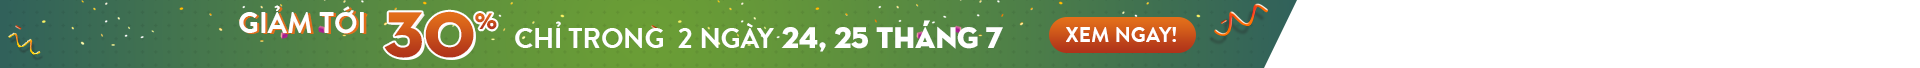 banner khuyen mai 15-02